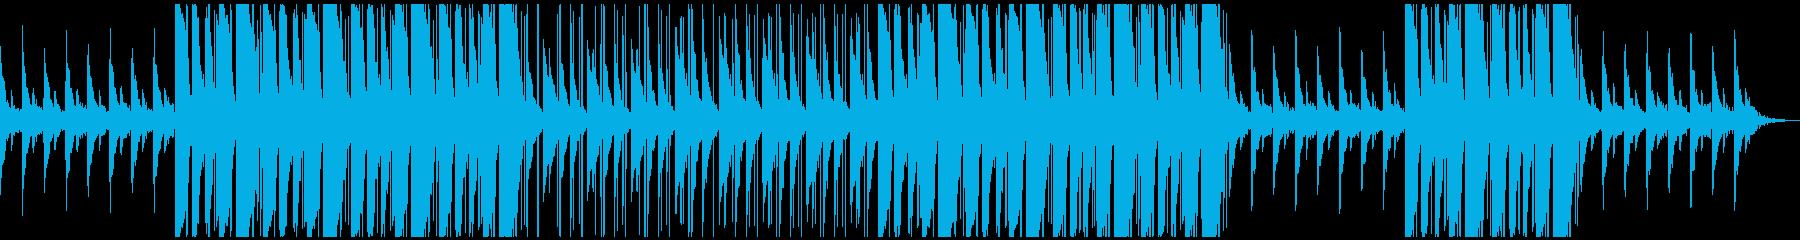 relax echo type beatの再生済みの波形